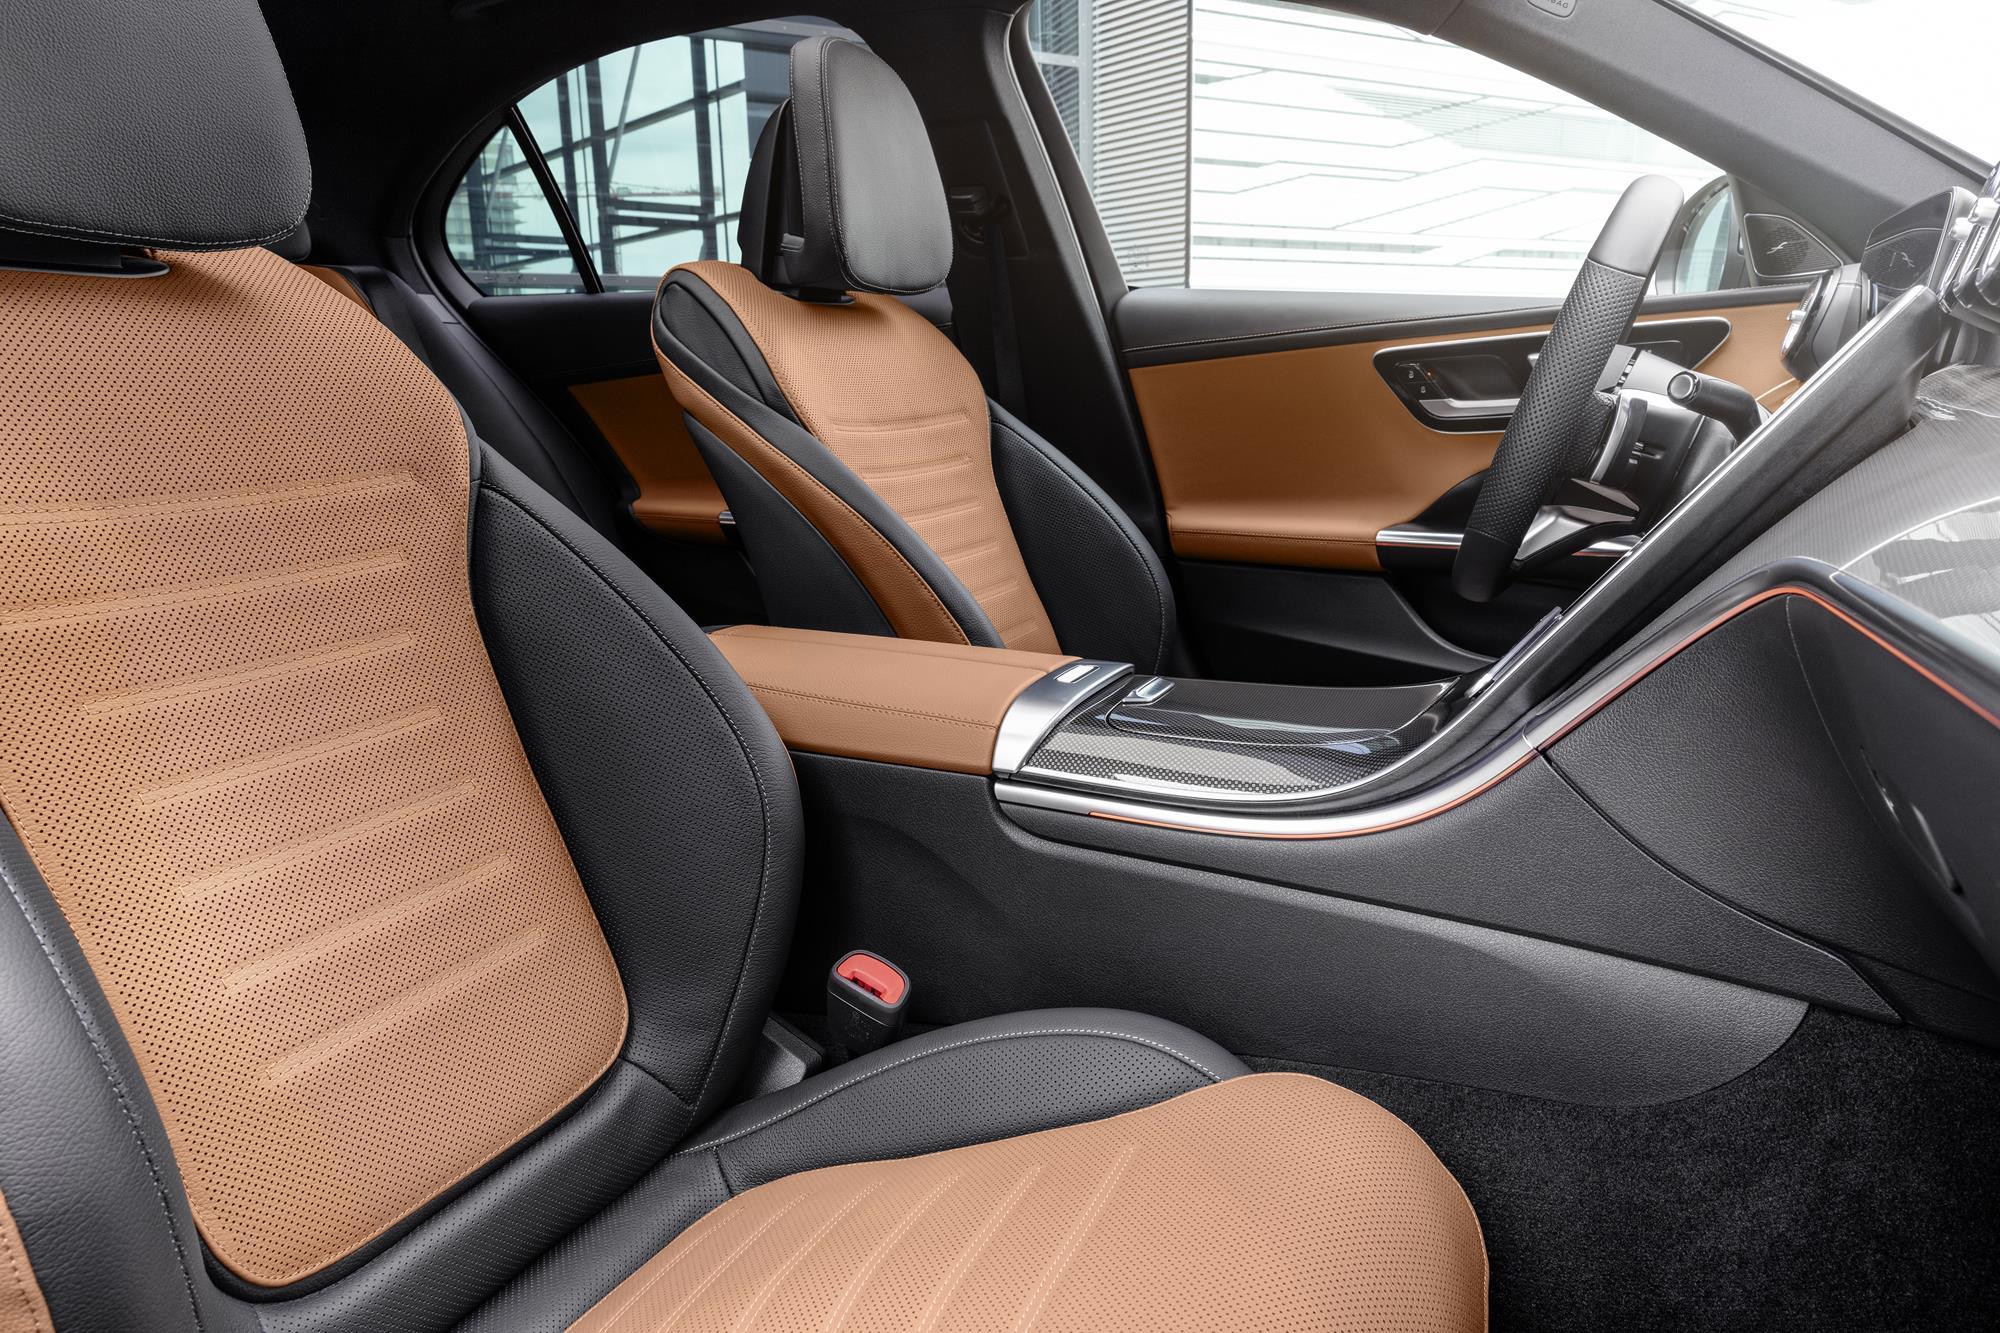 Mercedes-Benz-Classe-C-2022-12.jpg